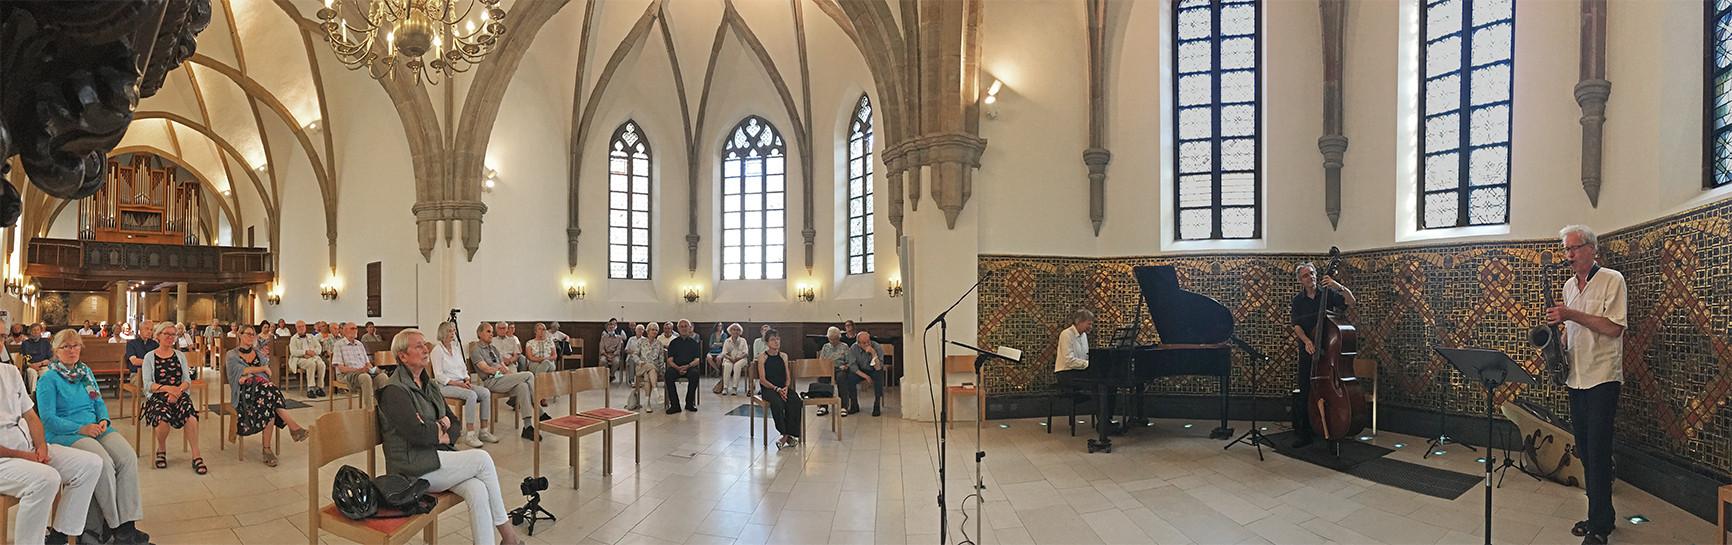 Kirche trifft Kino 9-8-2020_klein.jpg